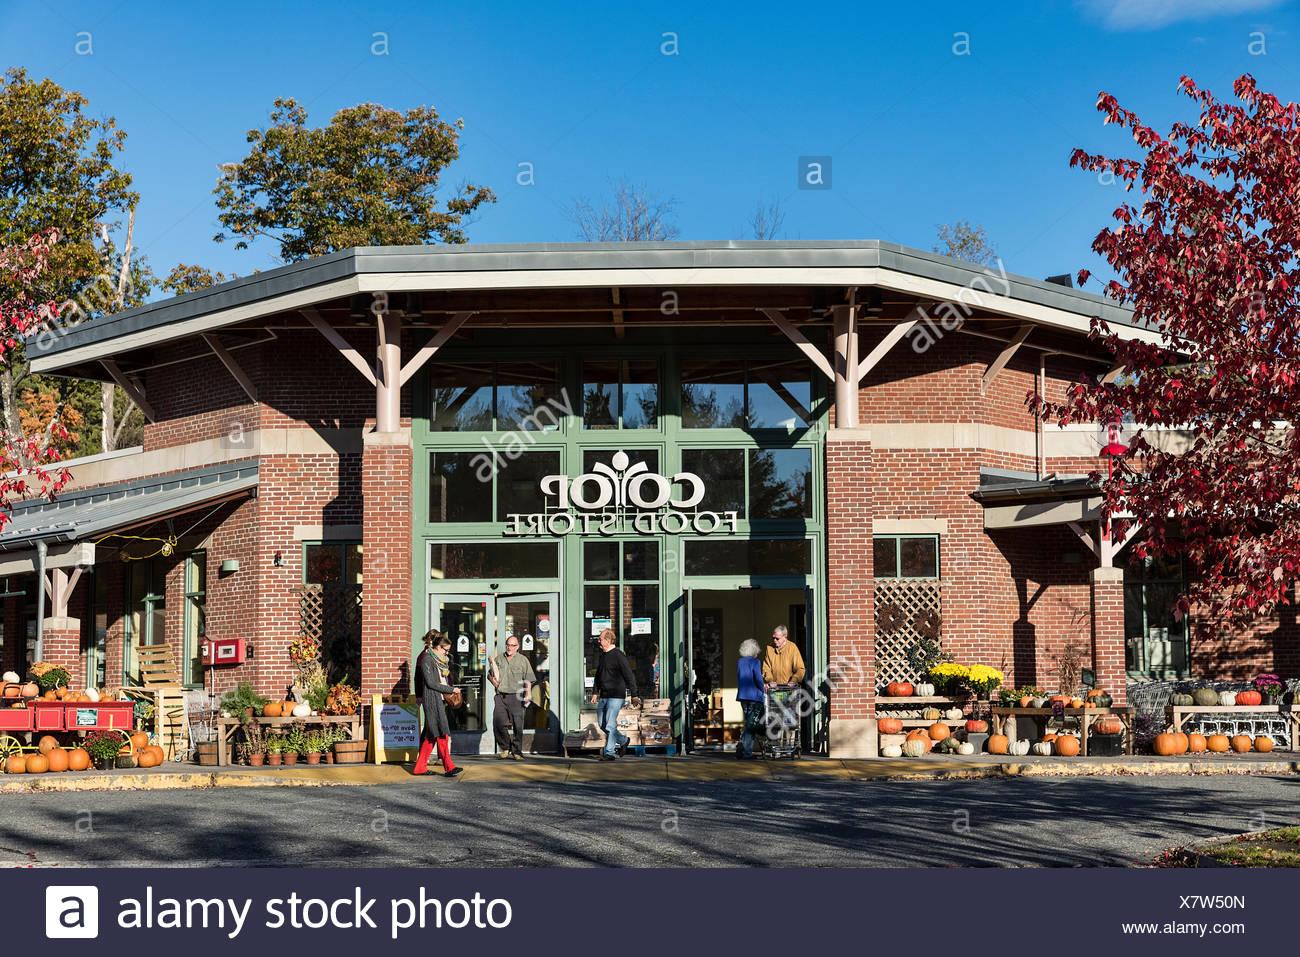 Coop, Food Store, Lebanon, New Hampshire, USA - Stock Image